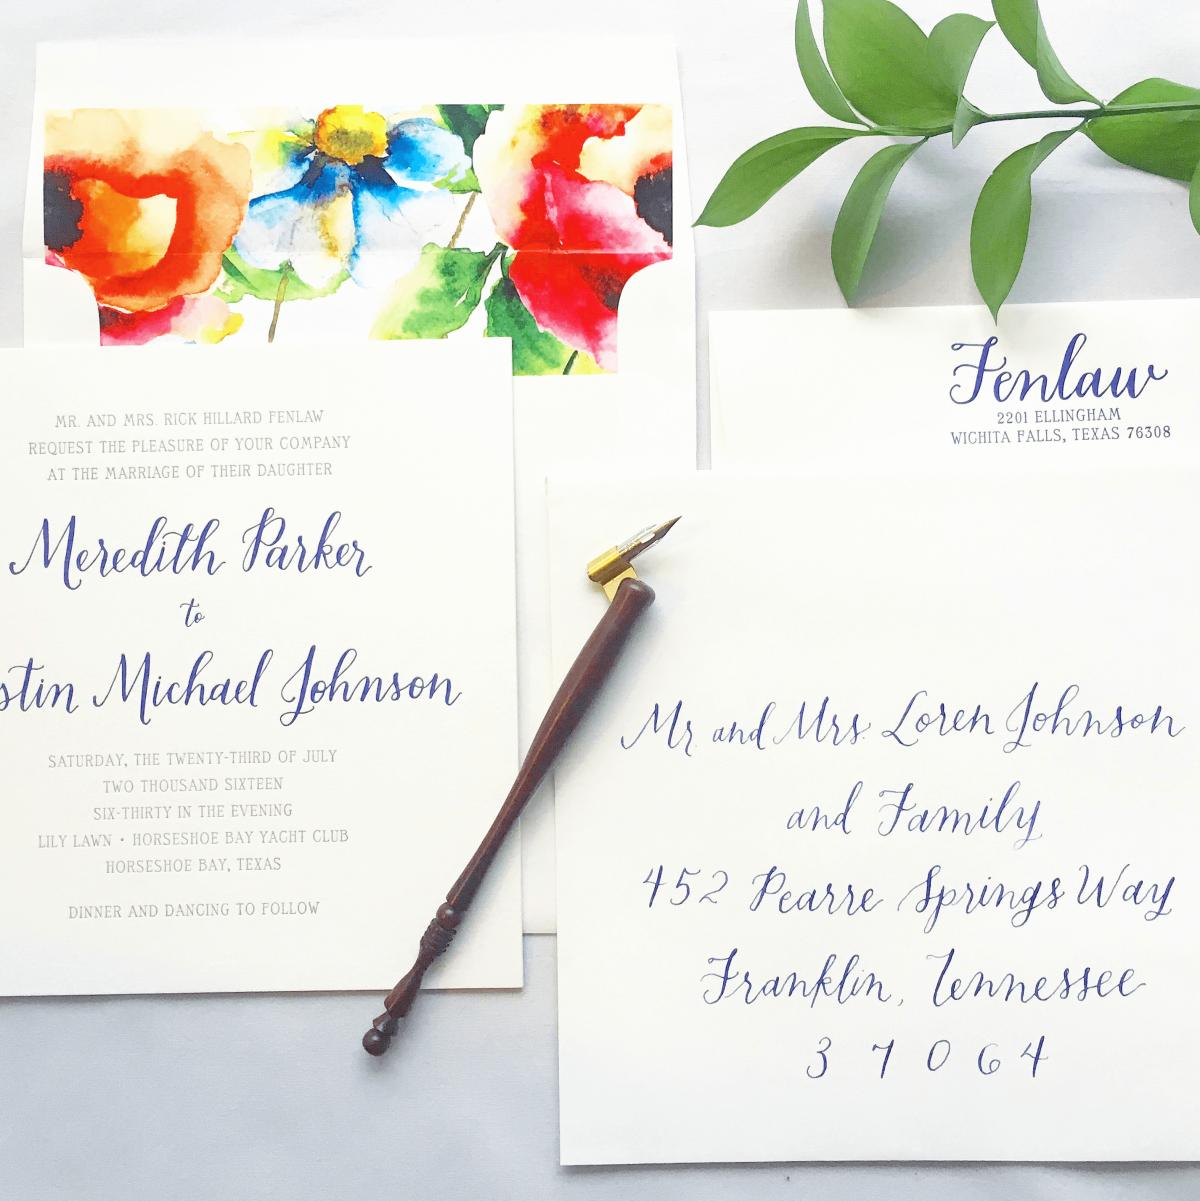 Exquisite Squid Allison Hembd wedding invitation calligraphy